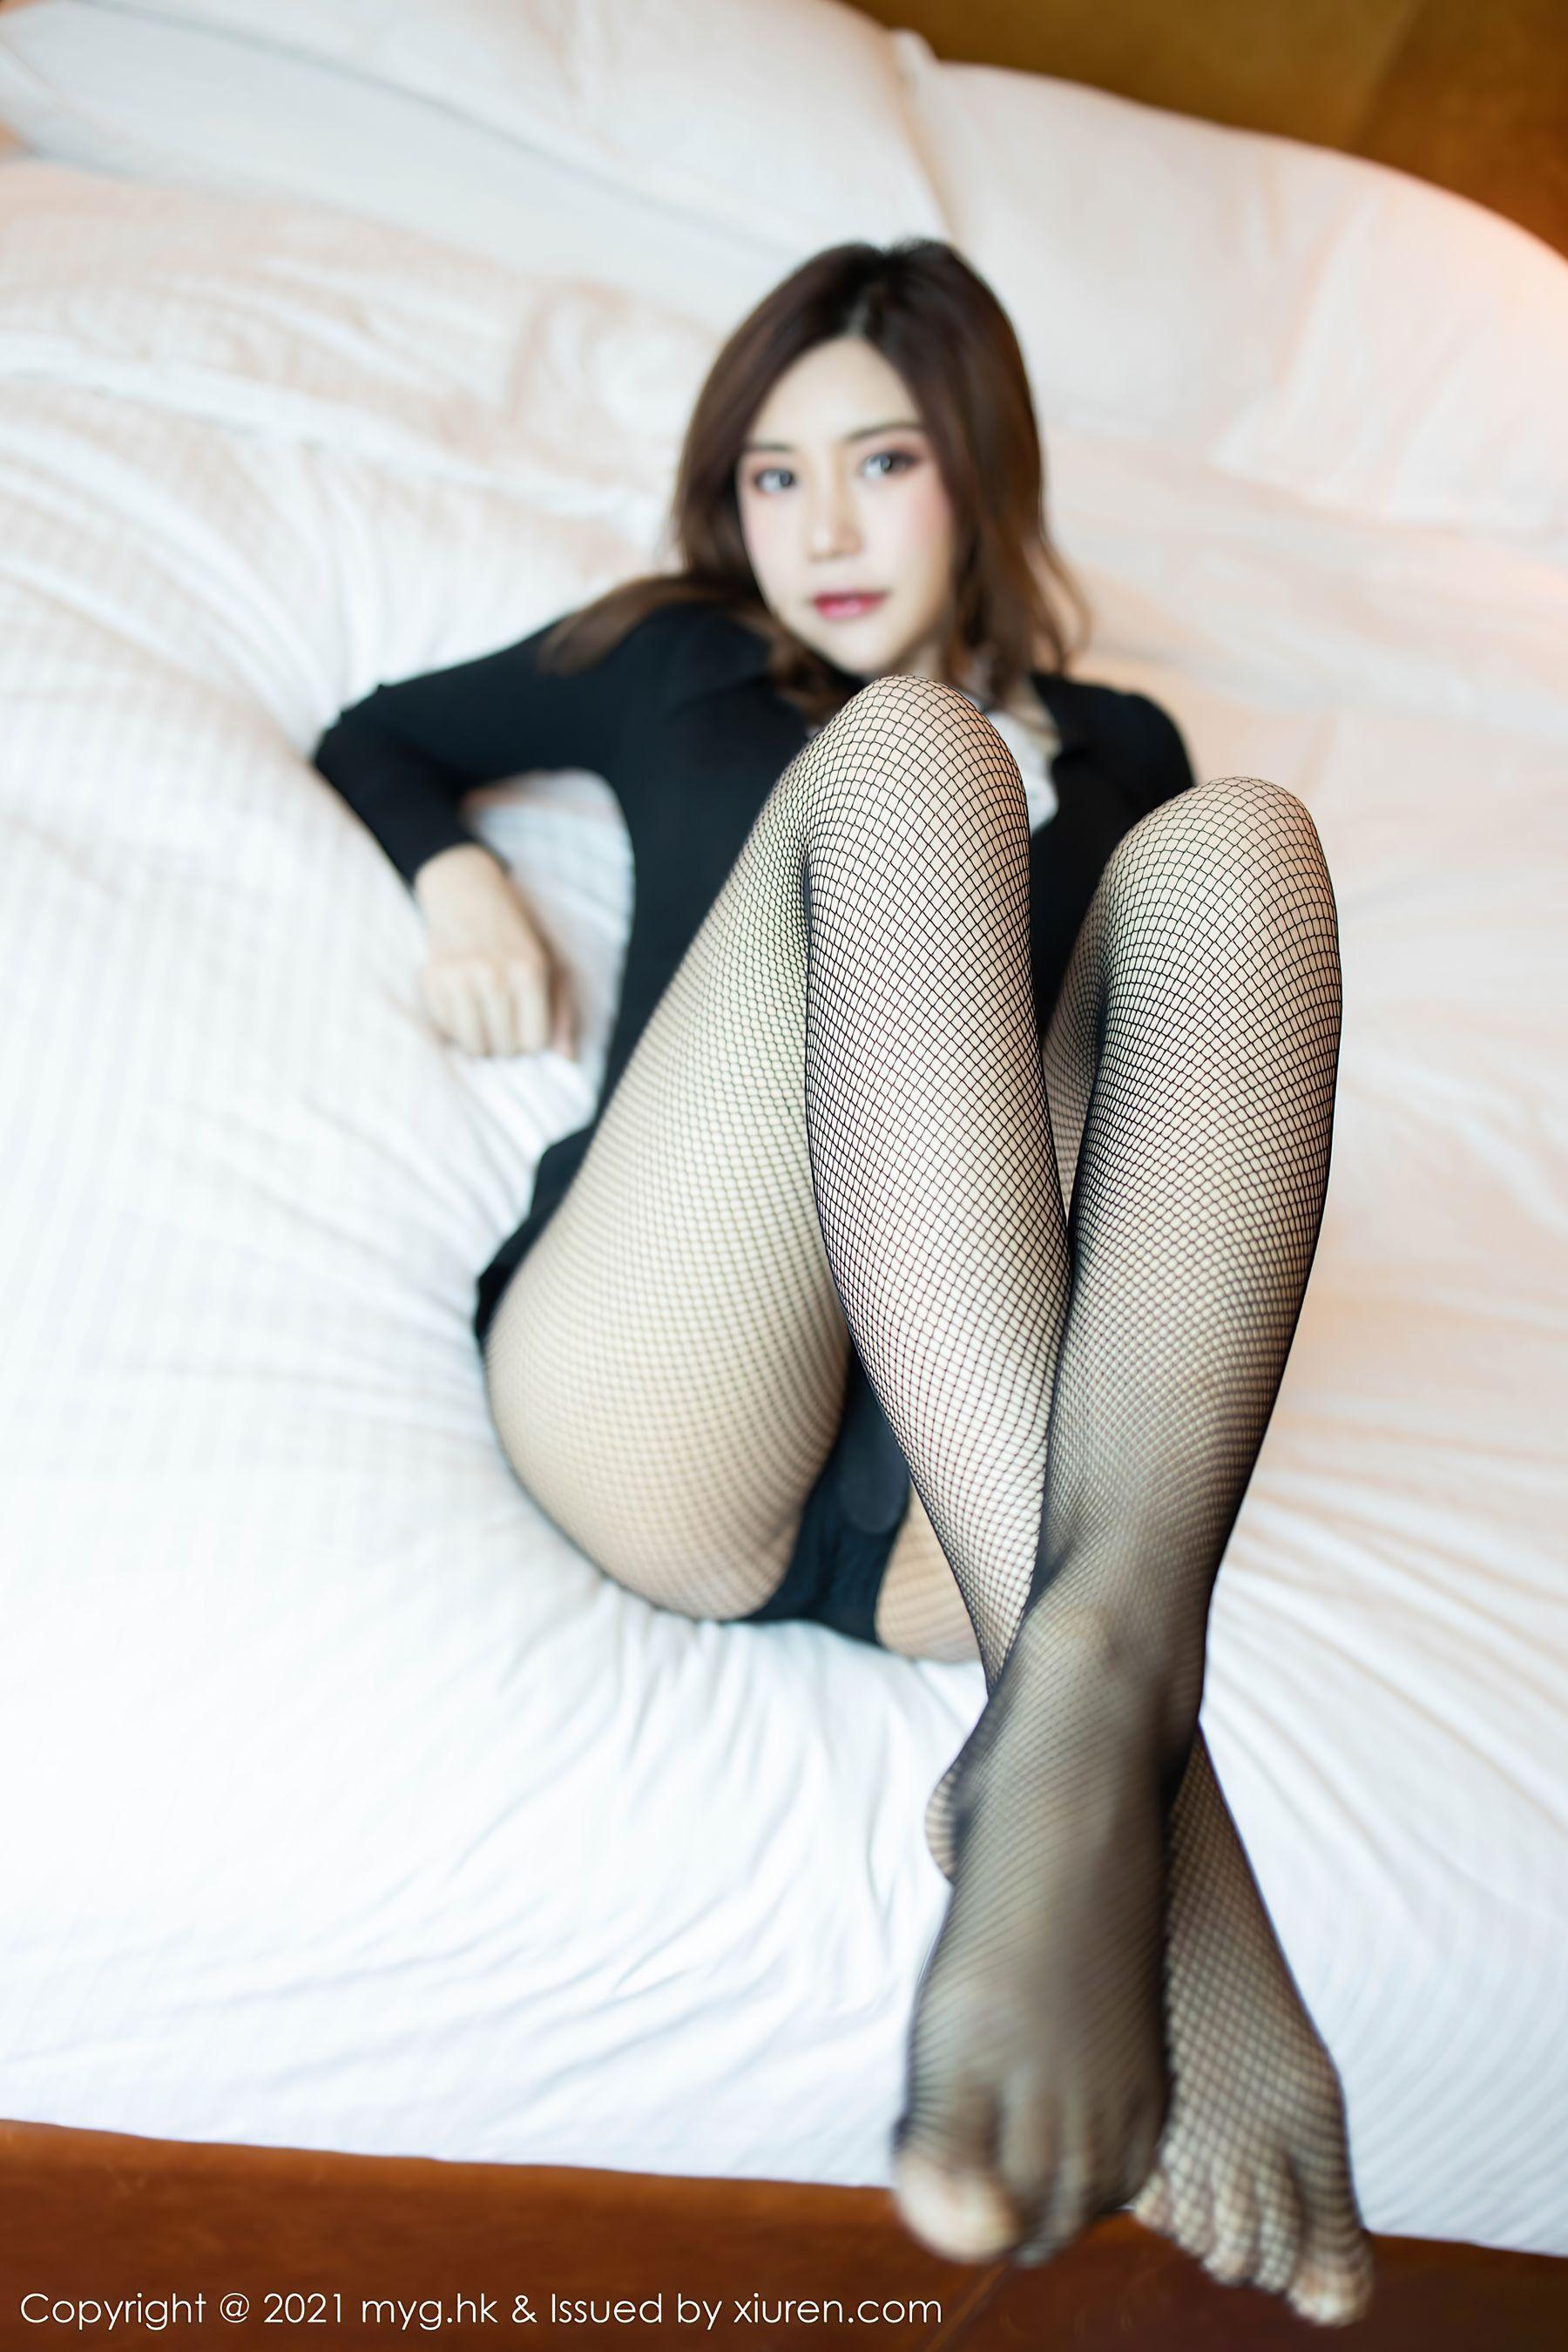 VOL.1298 [美媛馆]网袜床上黑丝诱惑:Carina梦绮(绮里嘉Ula)超高清写真套图(69P)